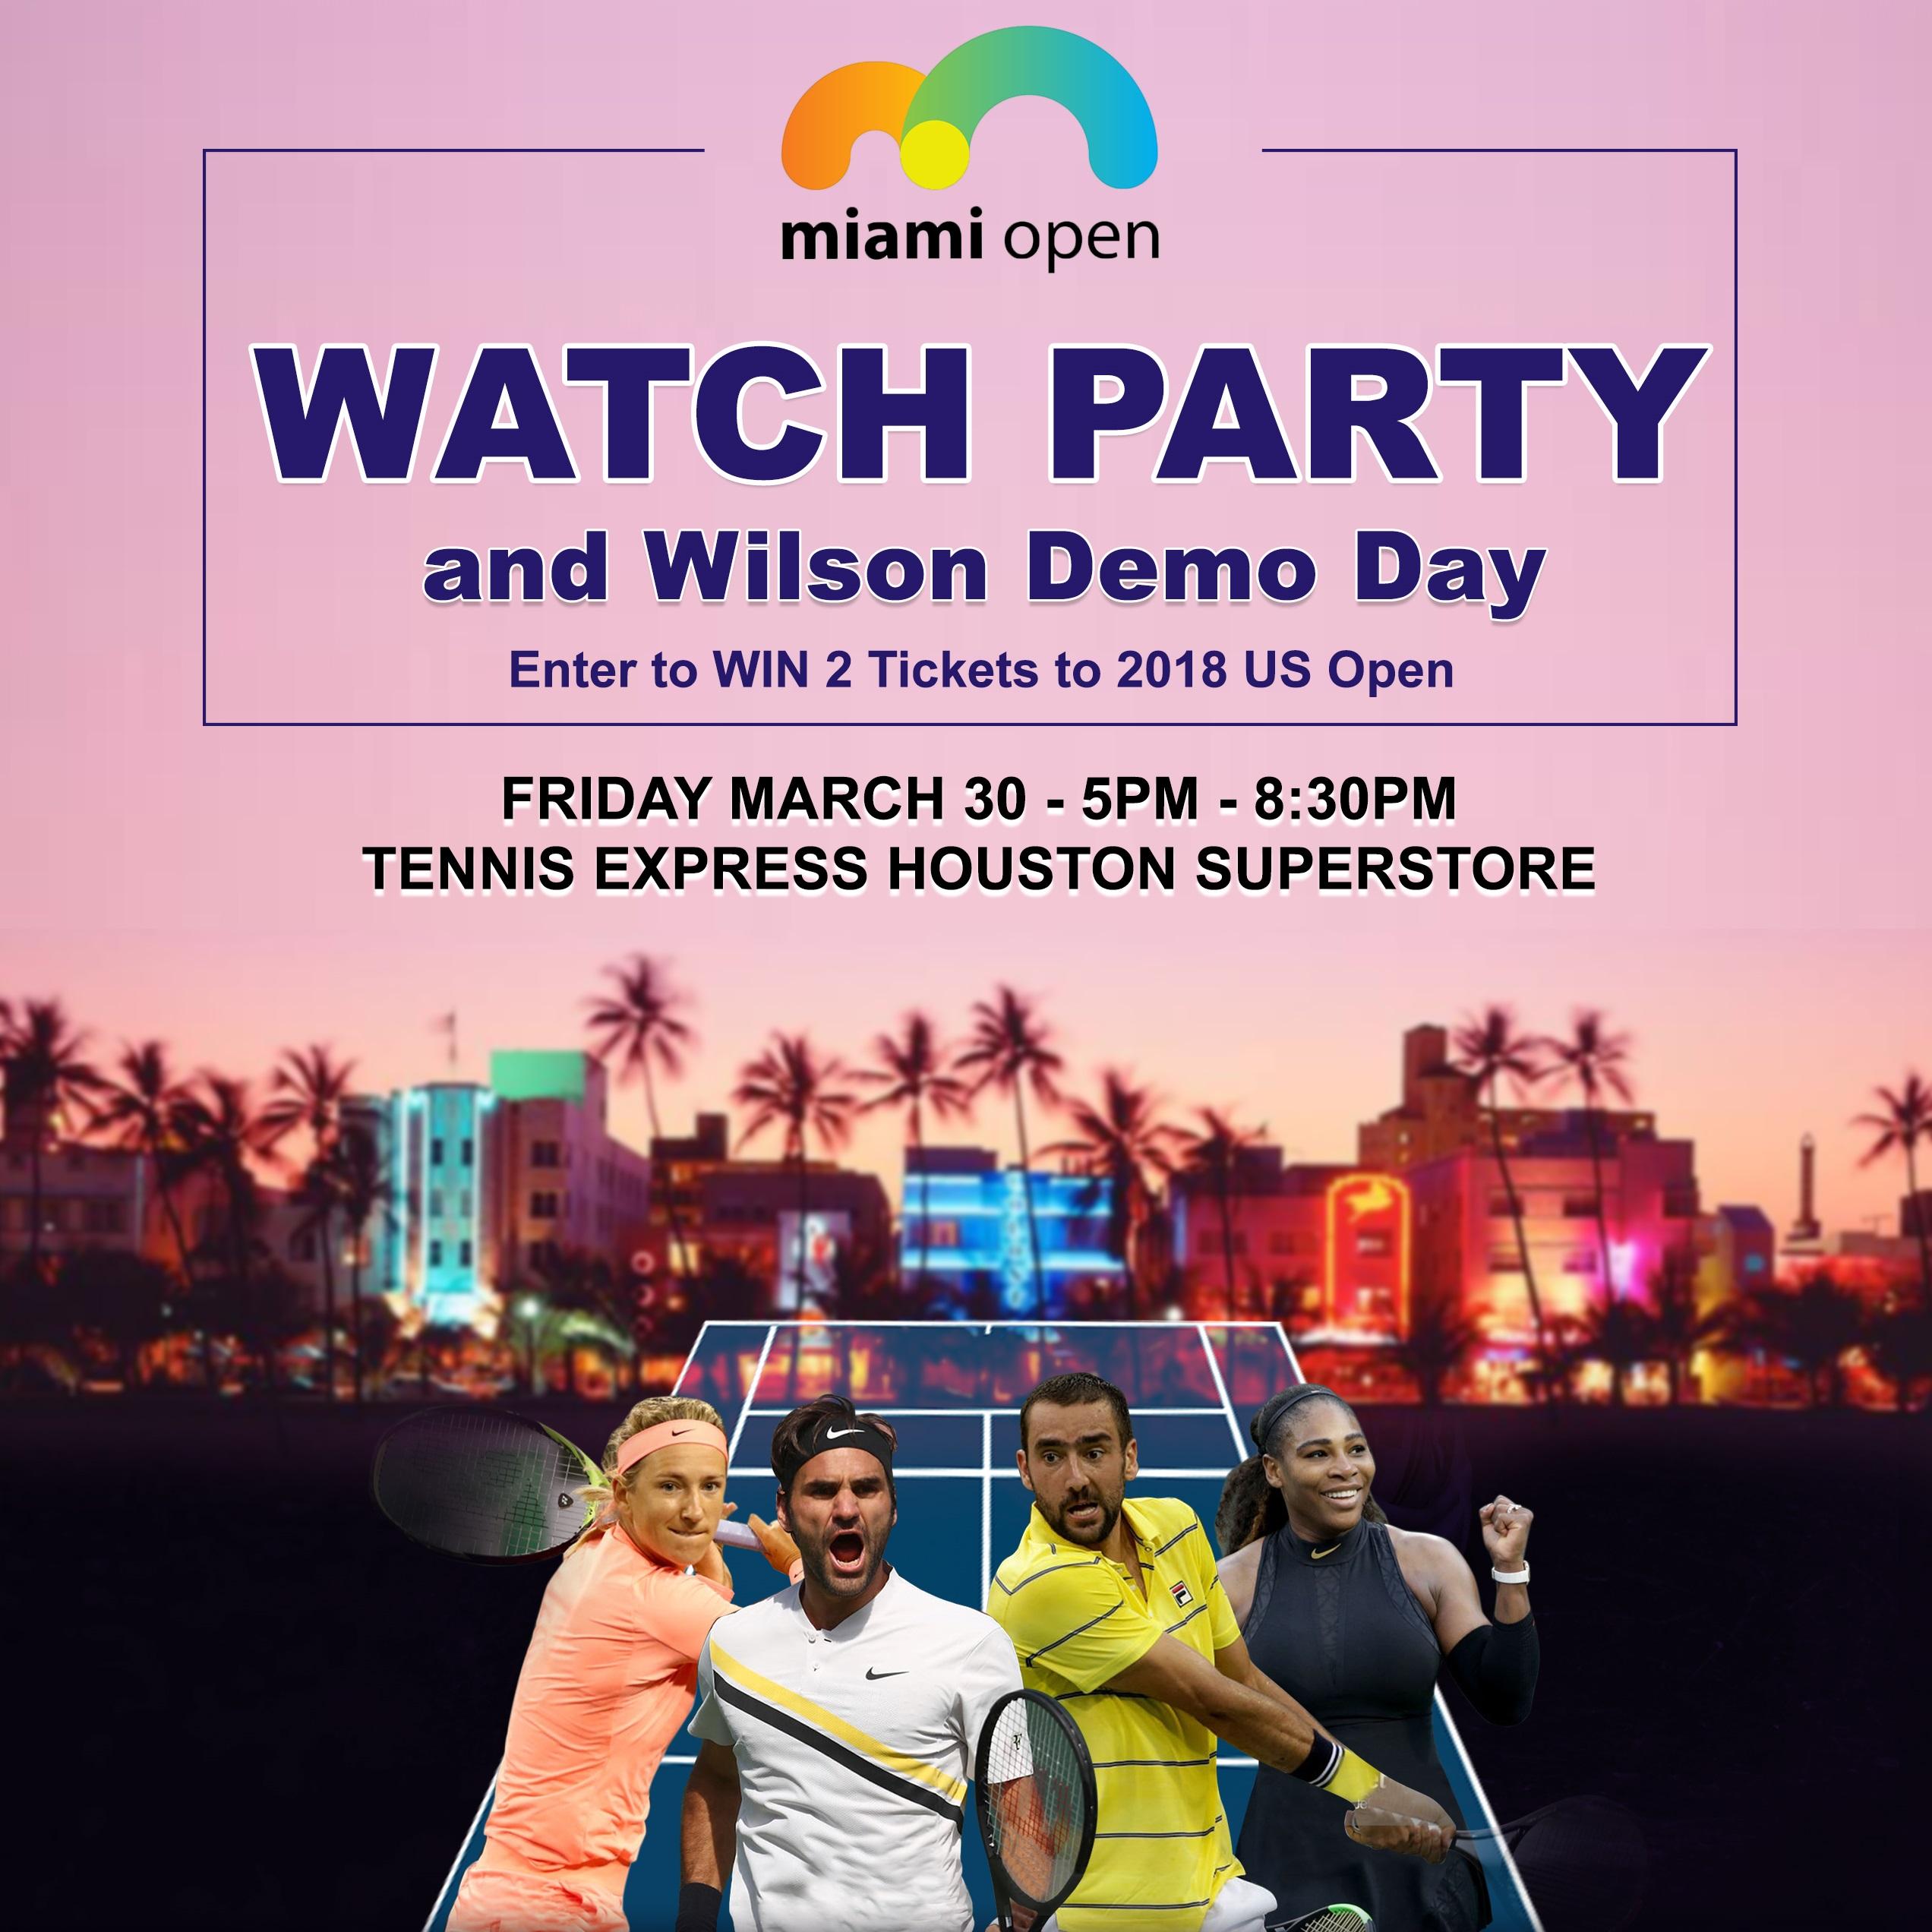 2018 Miami Open Watch Party at Tennis Express Thumbnail